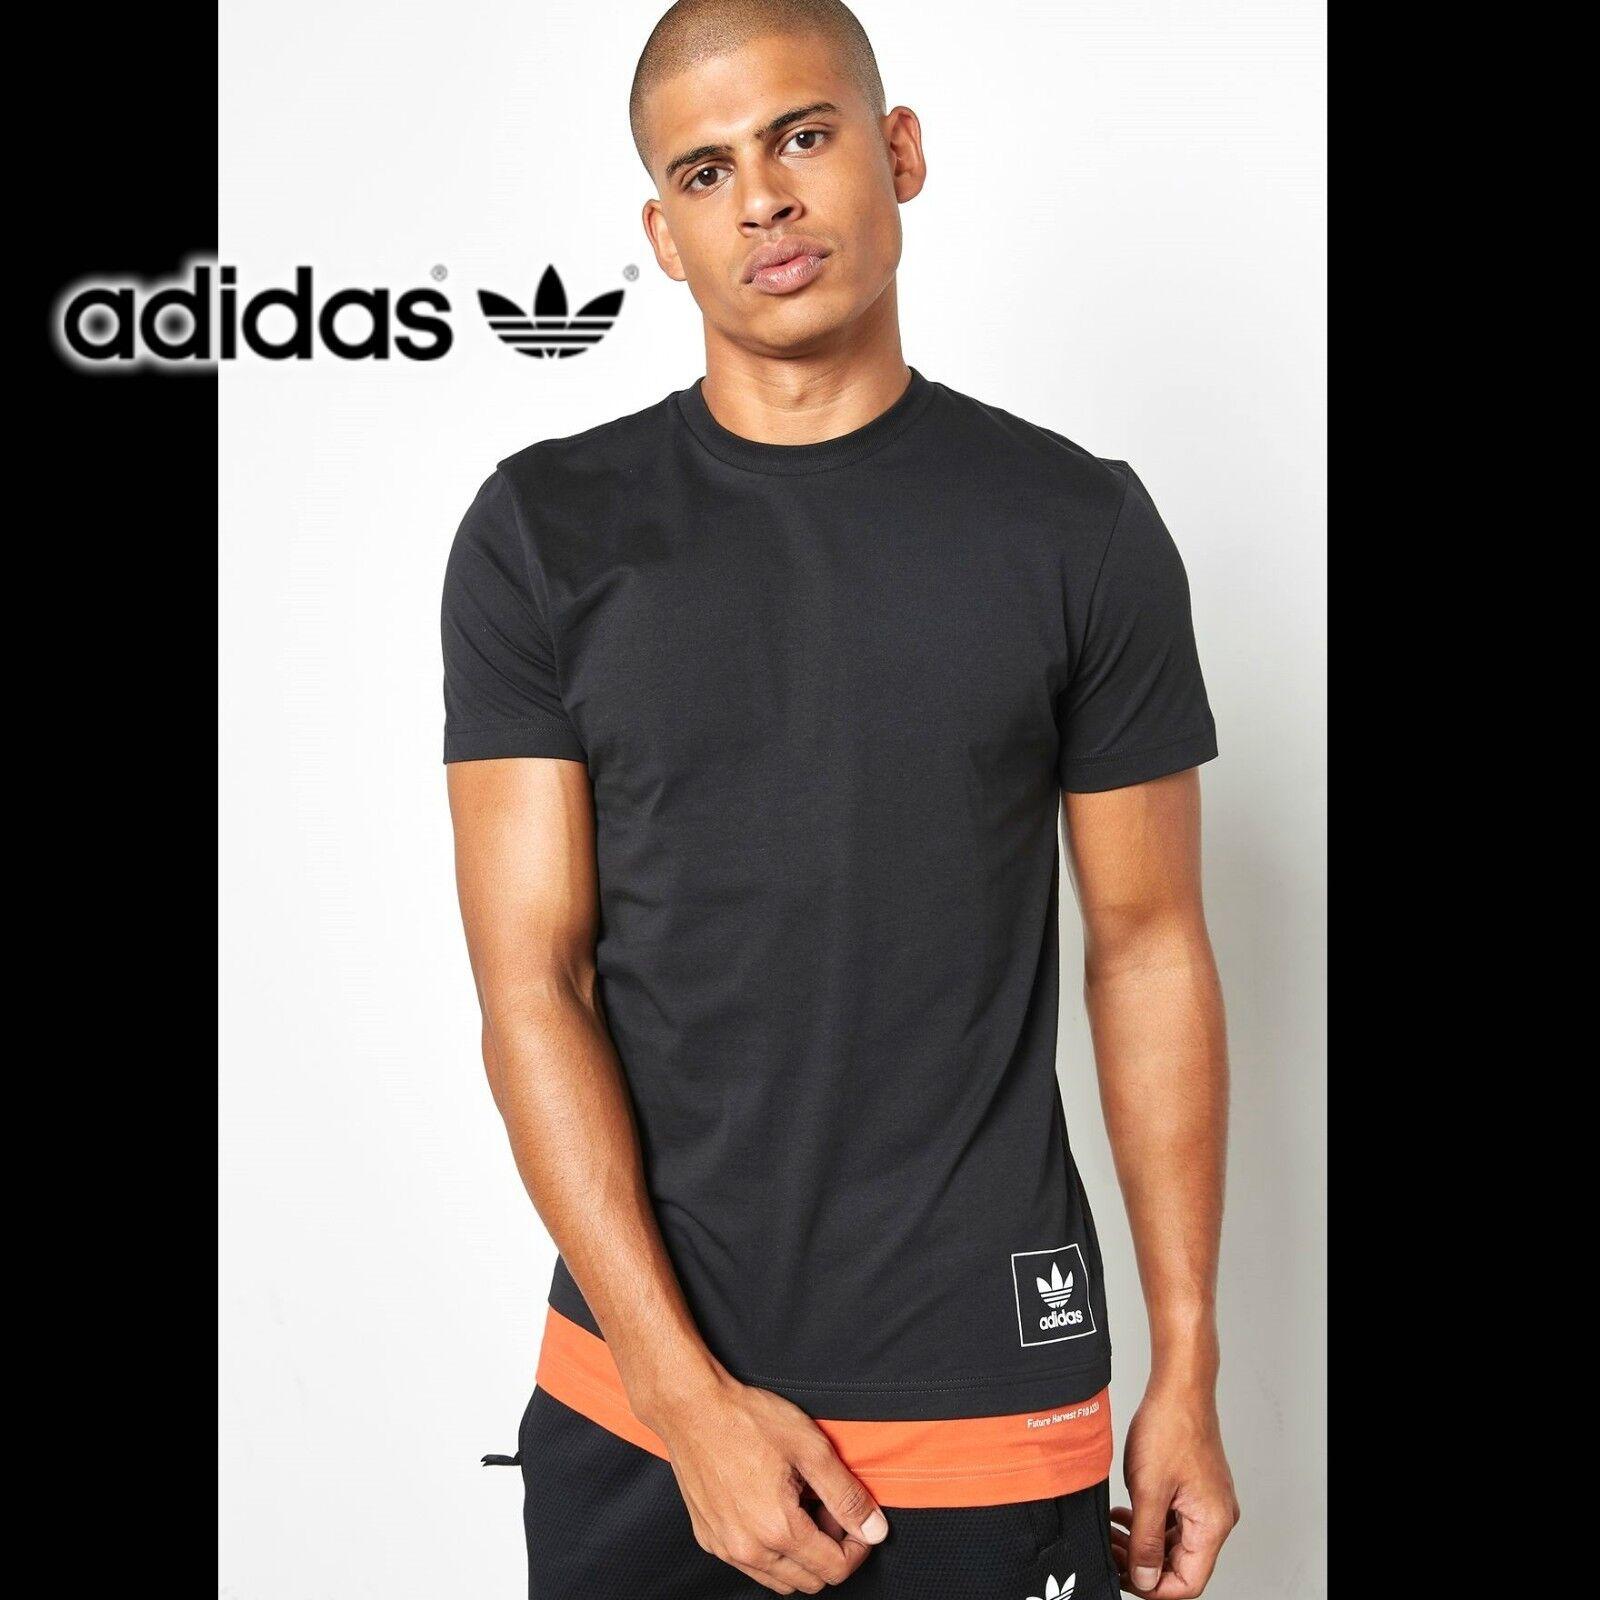 Adidas Originals Ανδρικά Ξ₯ποδΞ�ματα ΣύνδΡσμος Tee T Shirt Top ΓυμναστΞ�ριο ΔωρΡάν Tracked Post